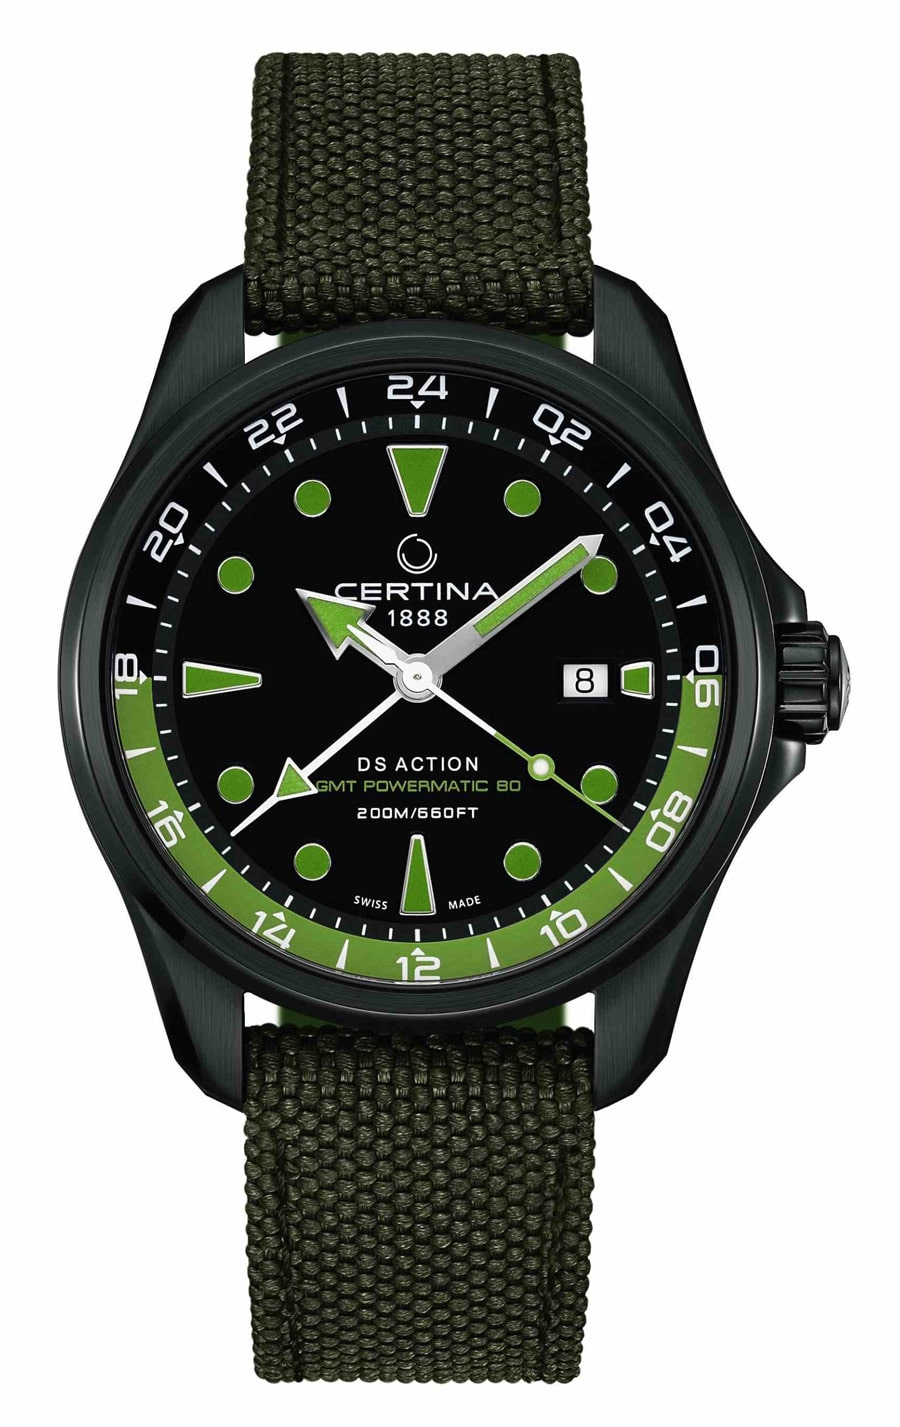 certina-ds-action-gmt-powermatic-80-GMT-Uhren